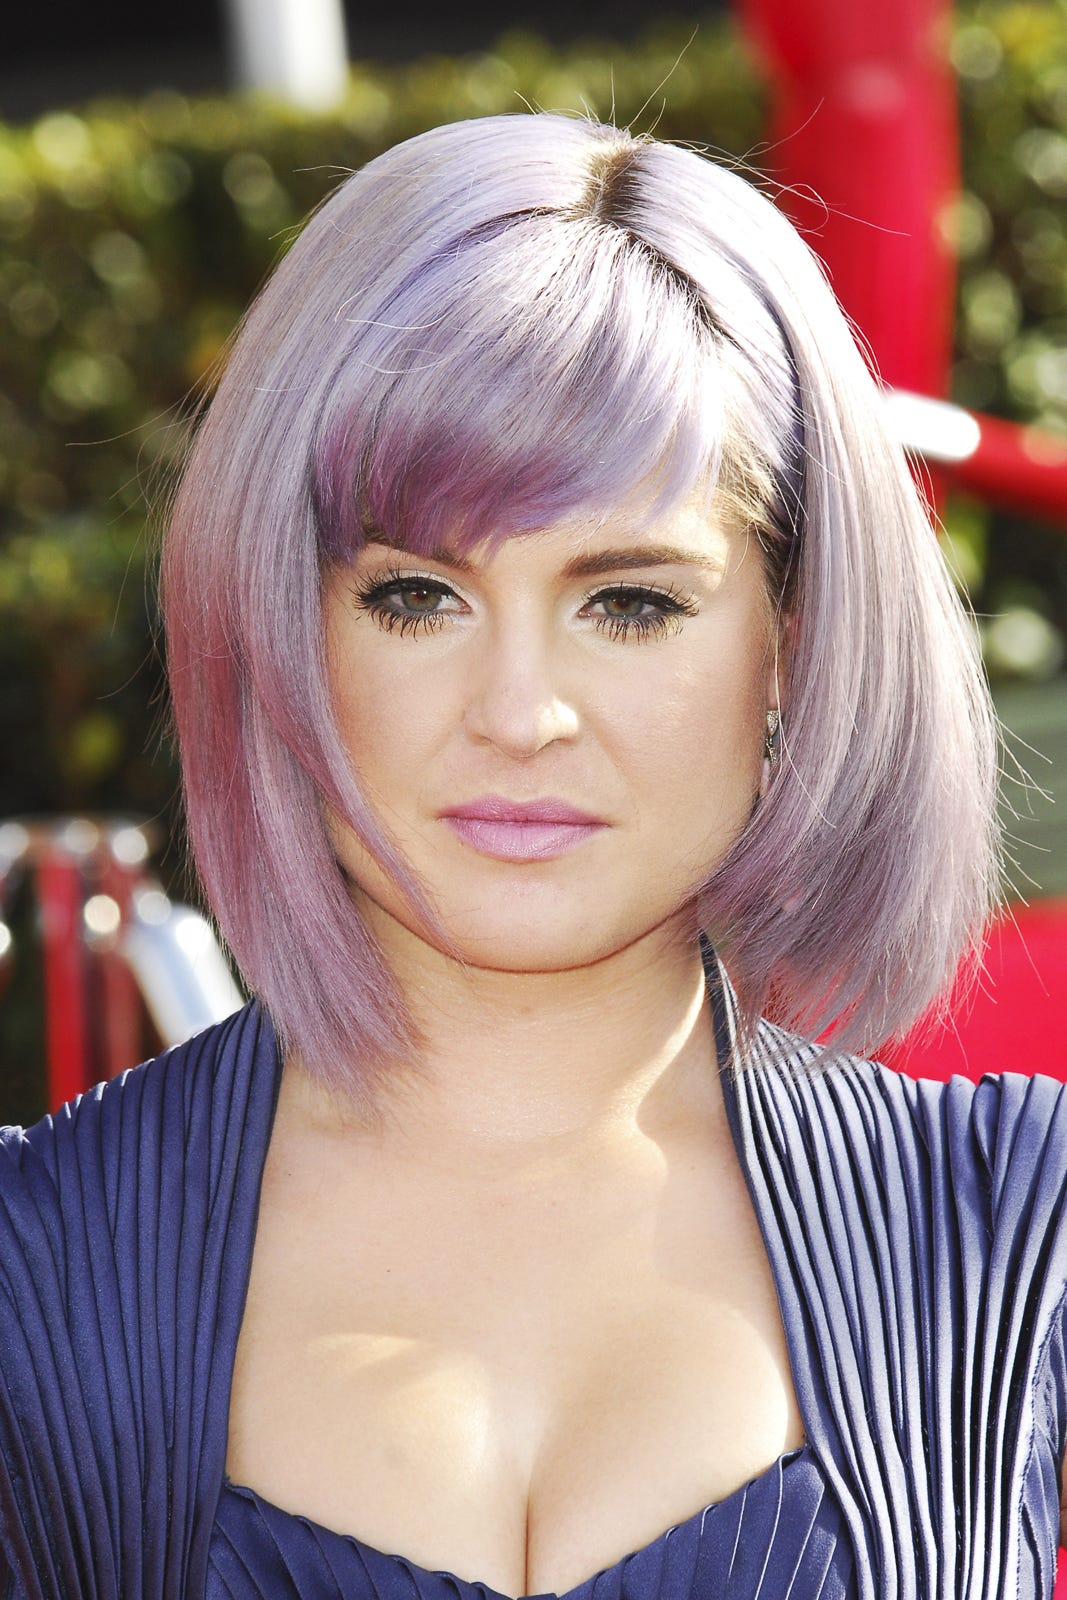 Pastel Hair Color Celebrities With Pink Purple Locks